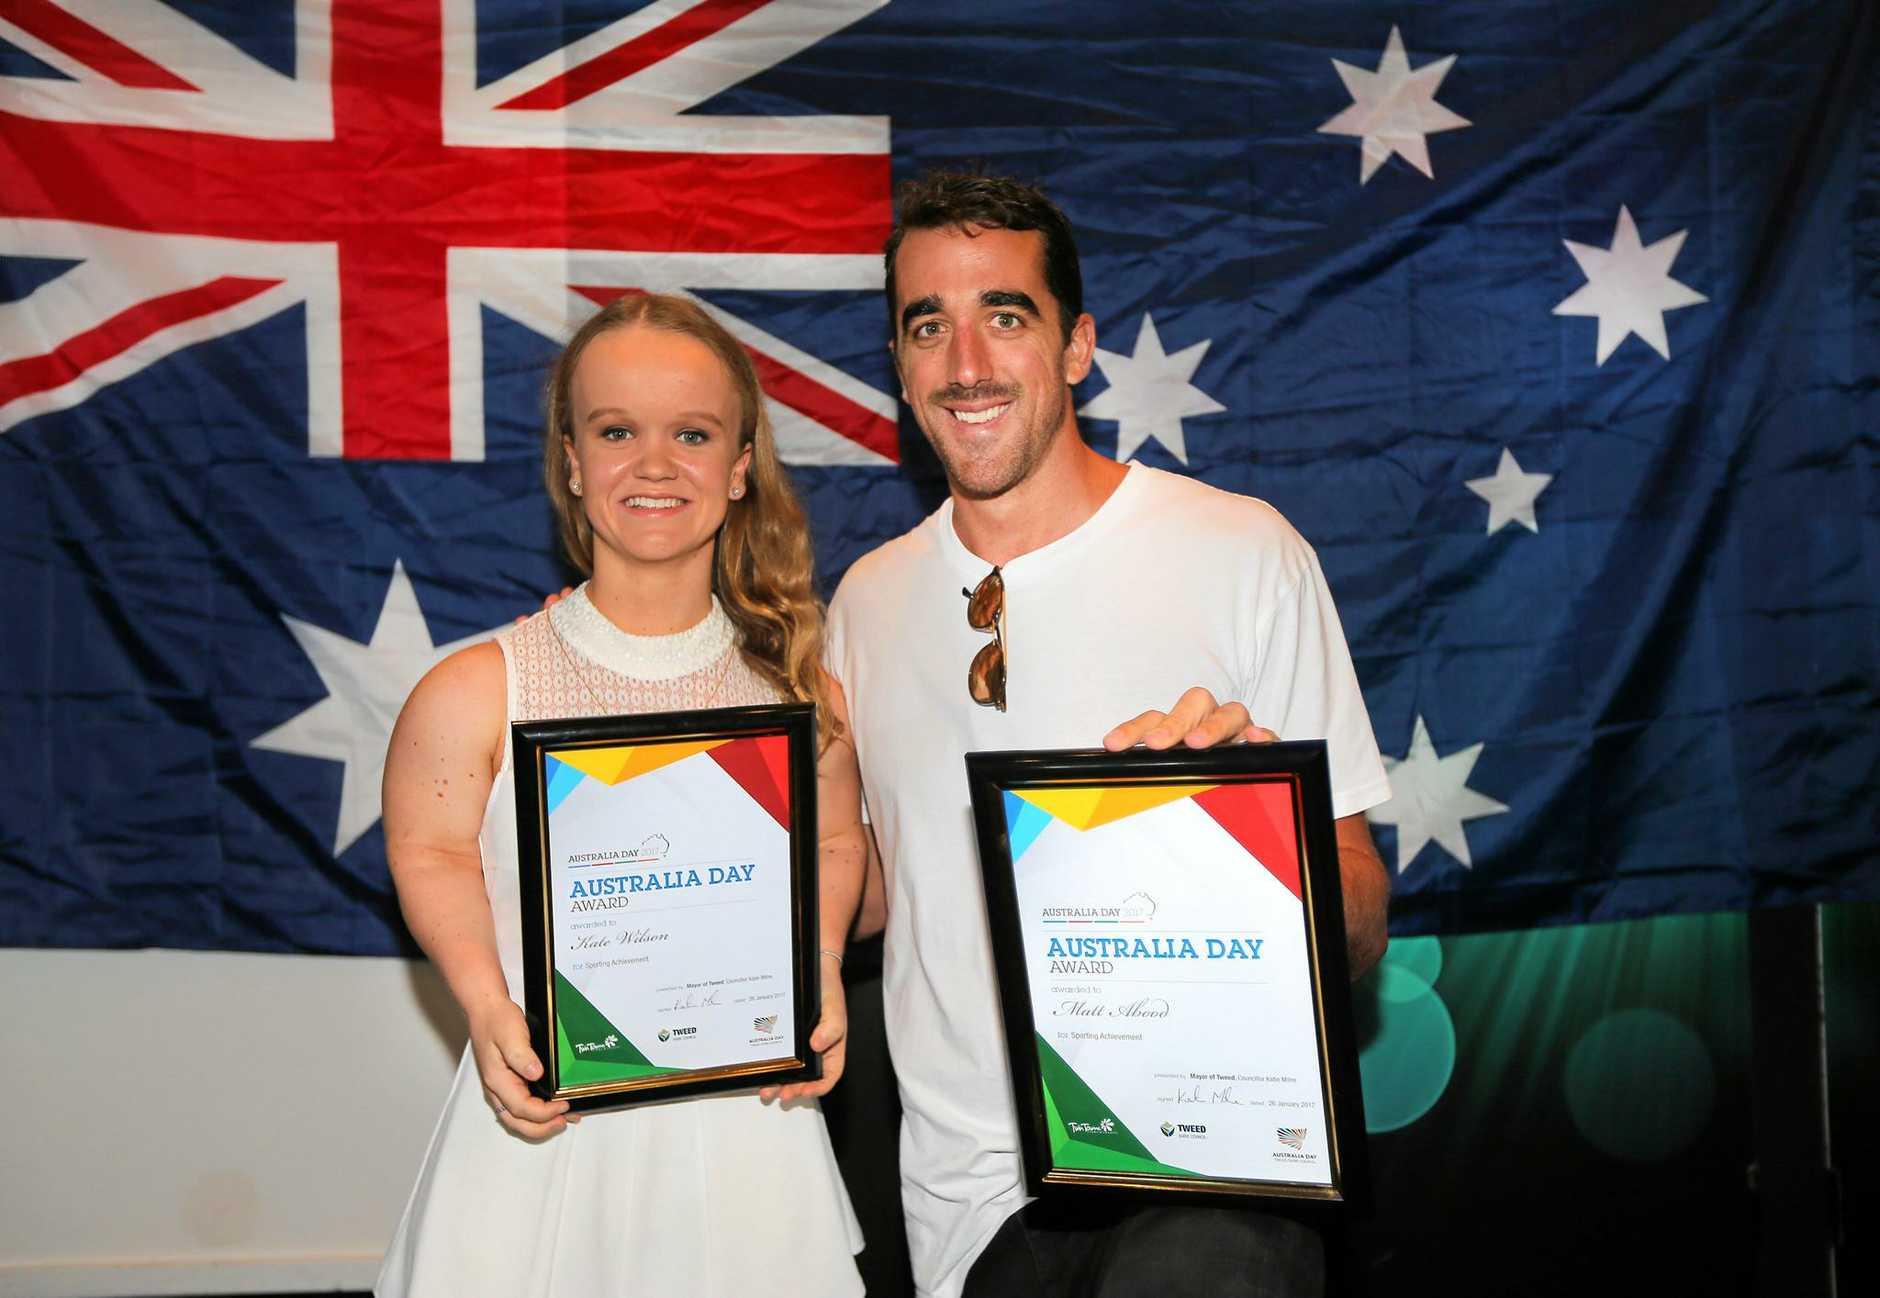 Tweed Shire Australia Day Sporting Acheivement of the Year award winners , Kate Kate Wilson and Matt Abood.